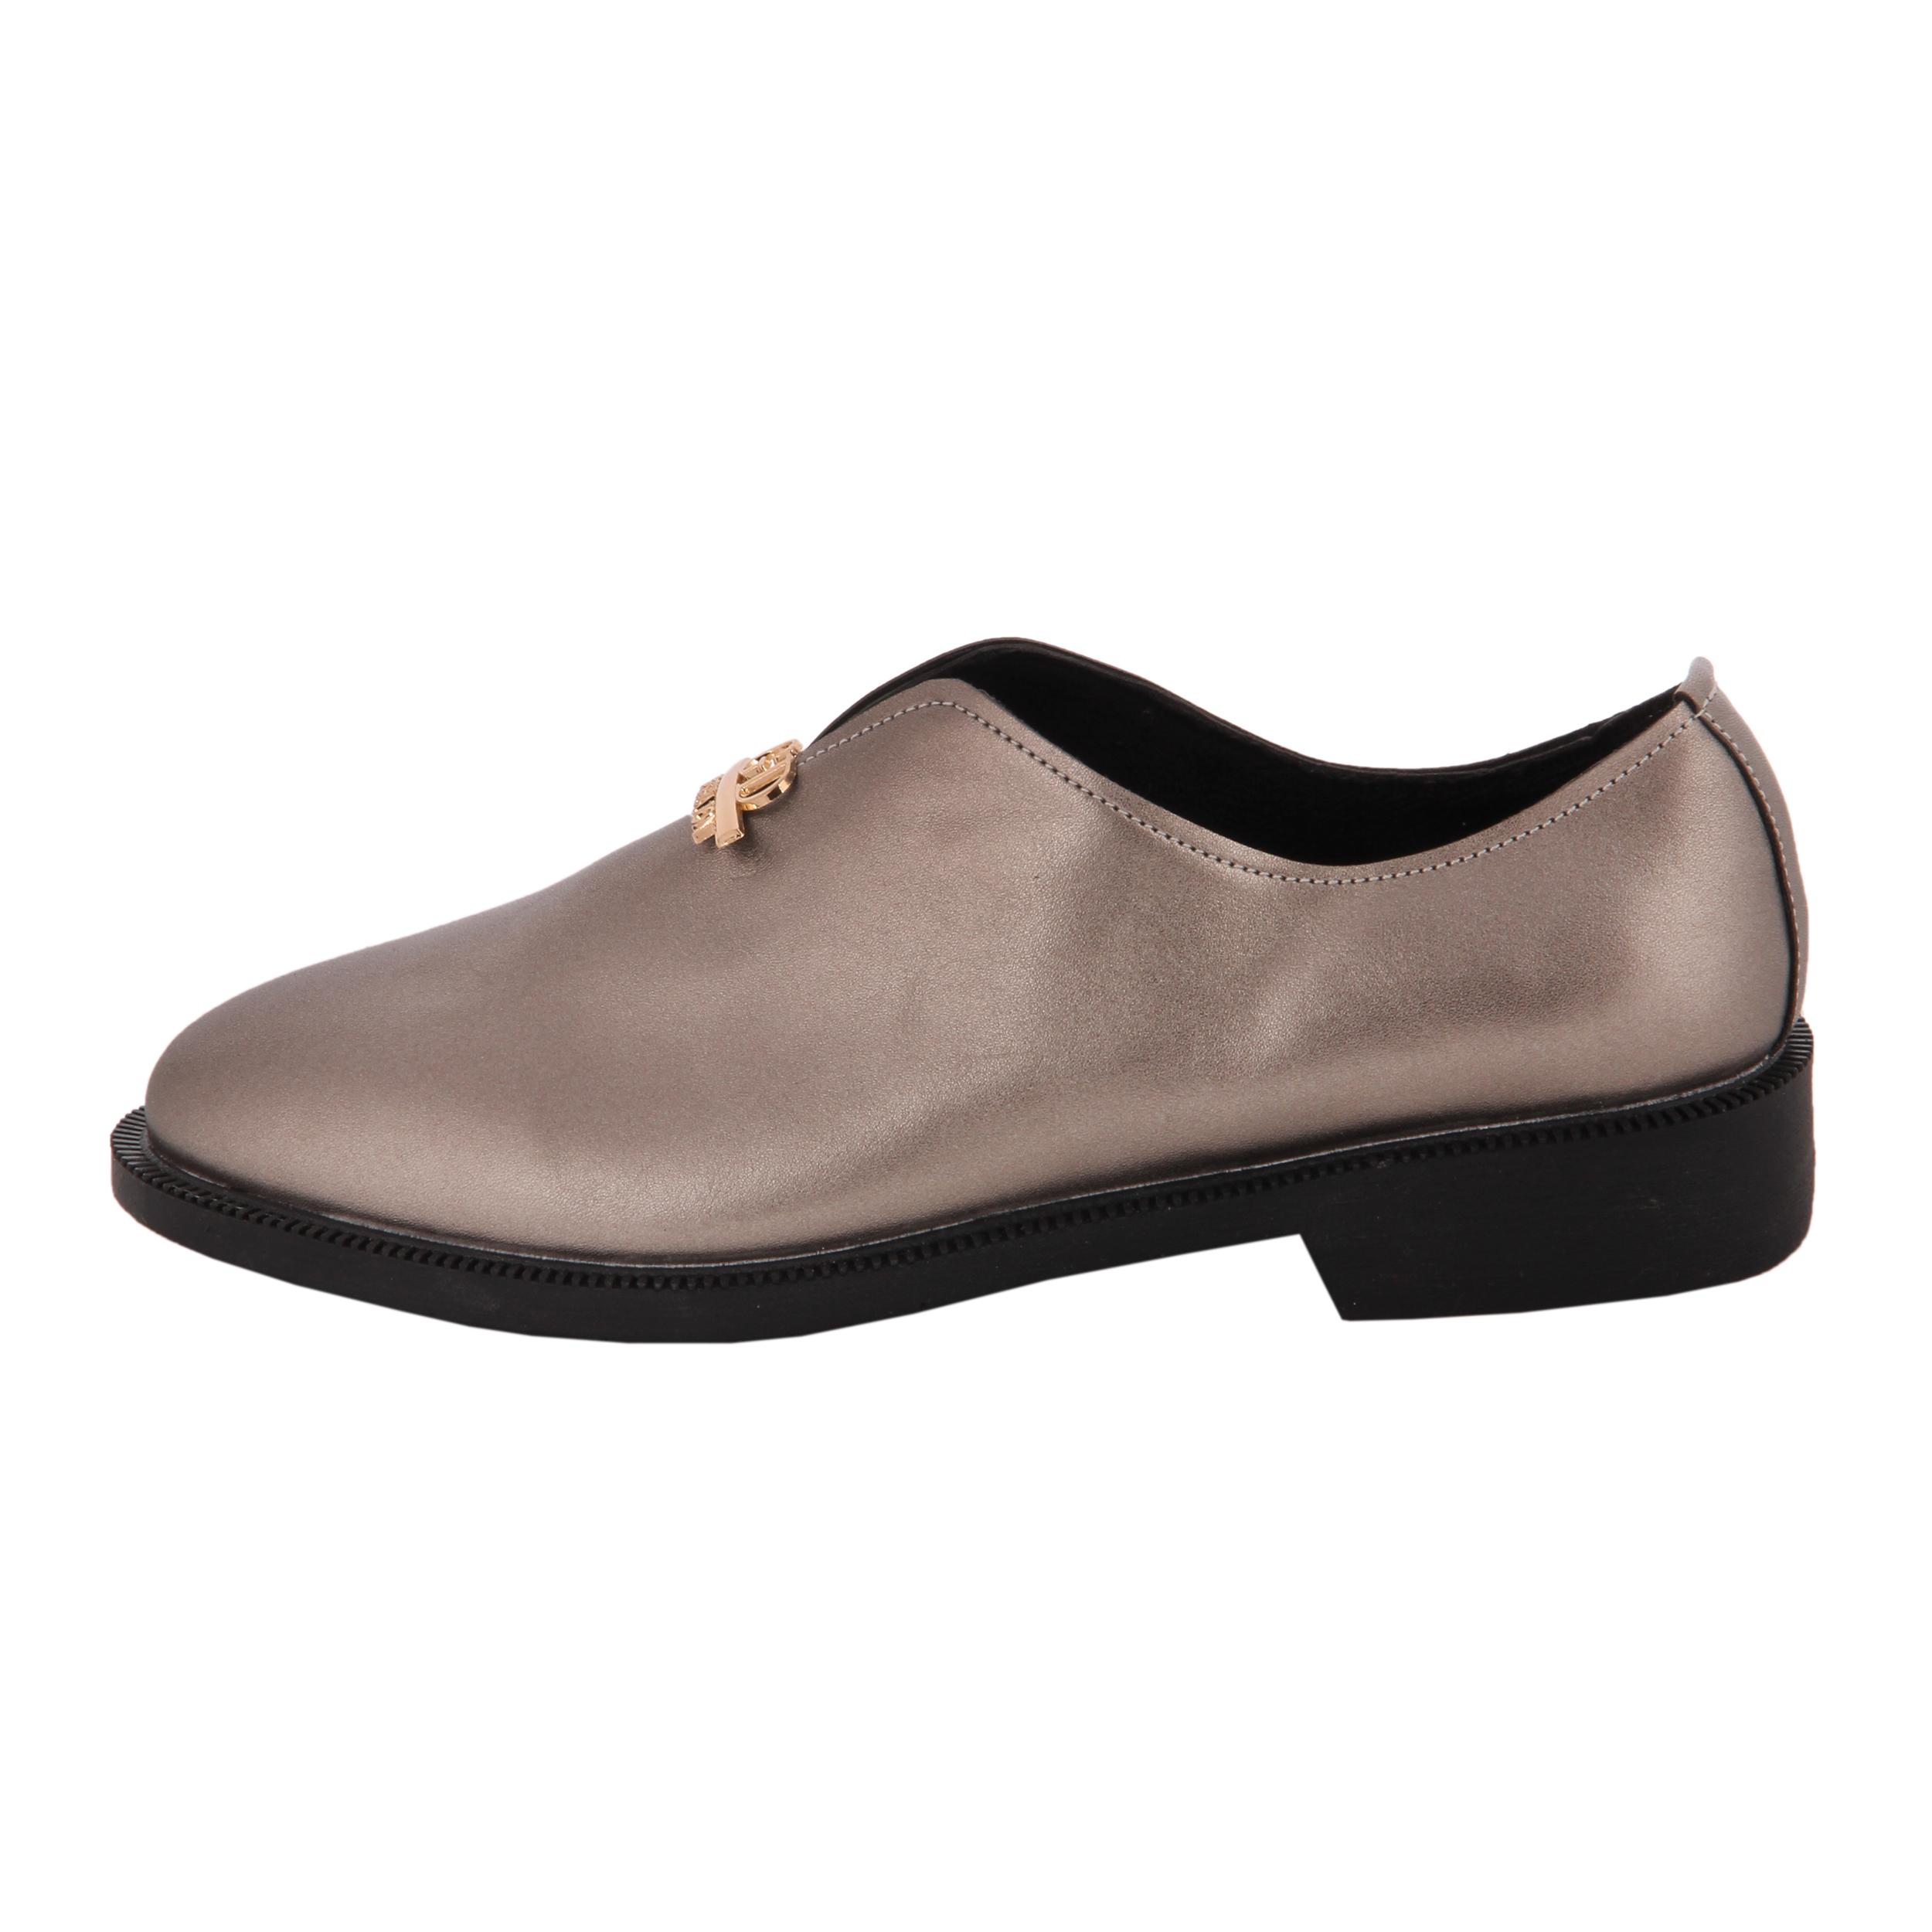 تصویر کفش زنانه کد 377